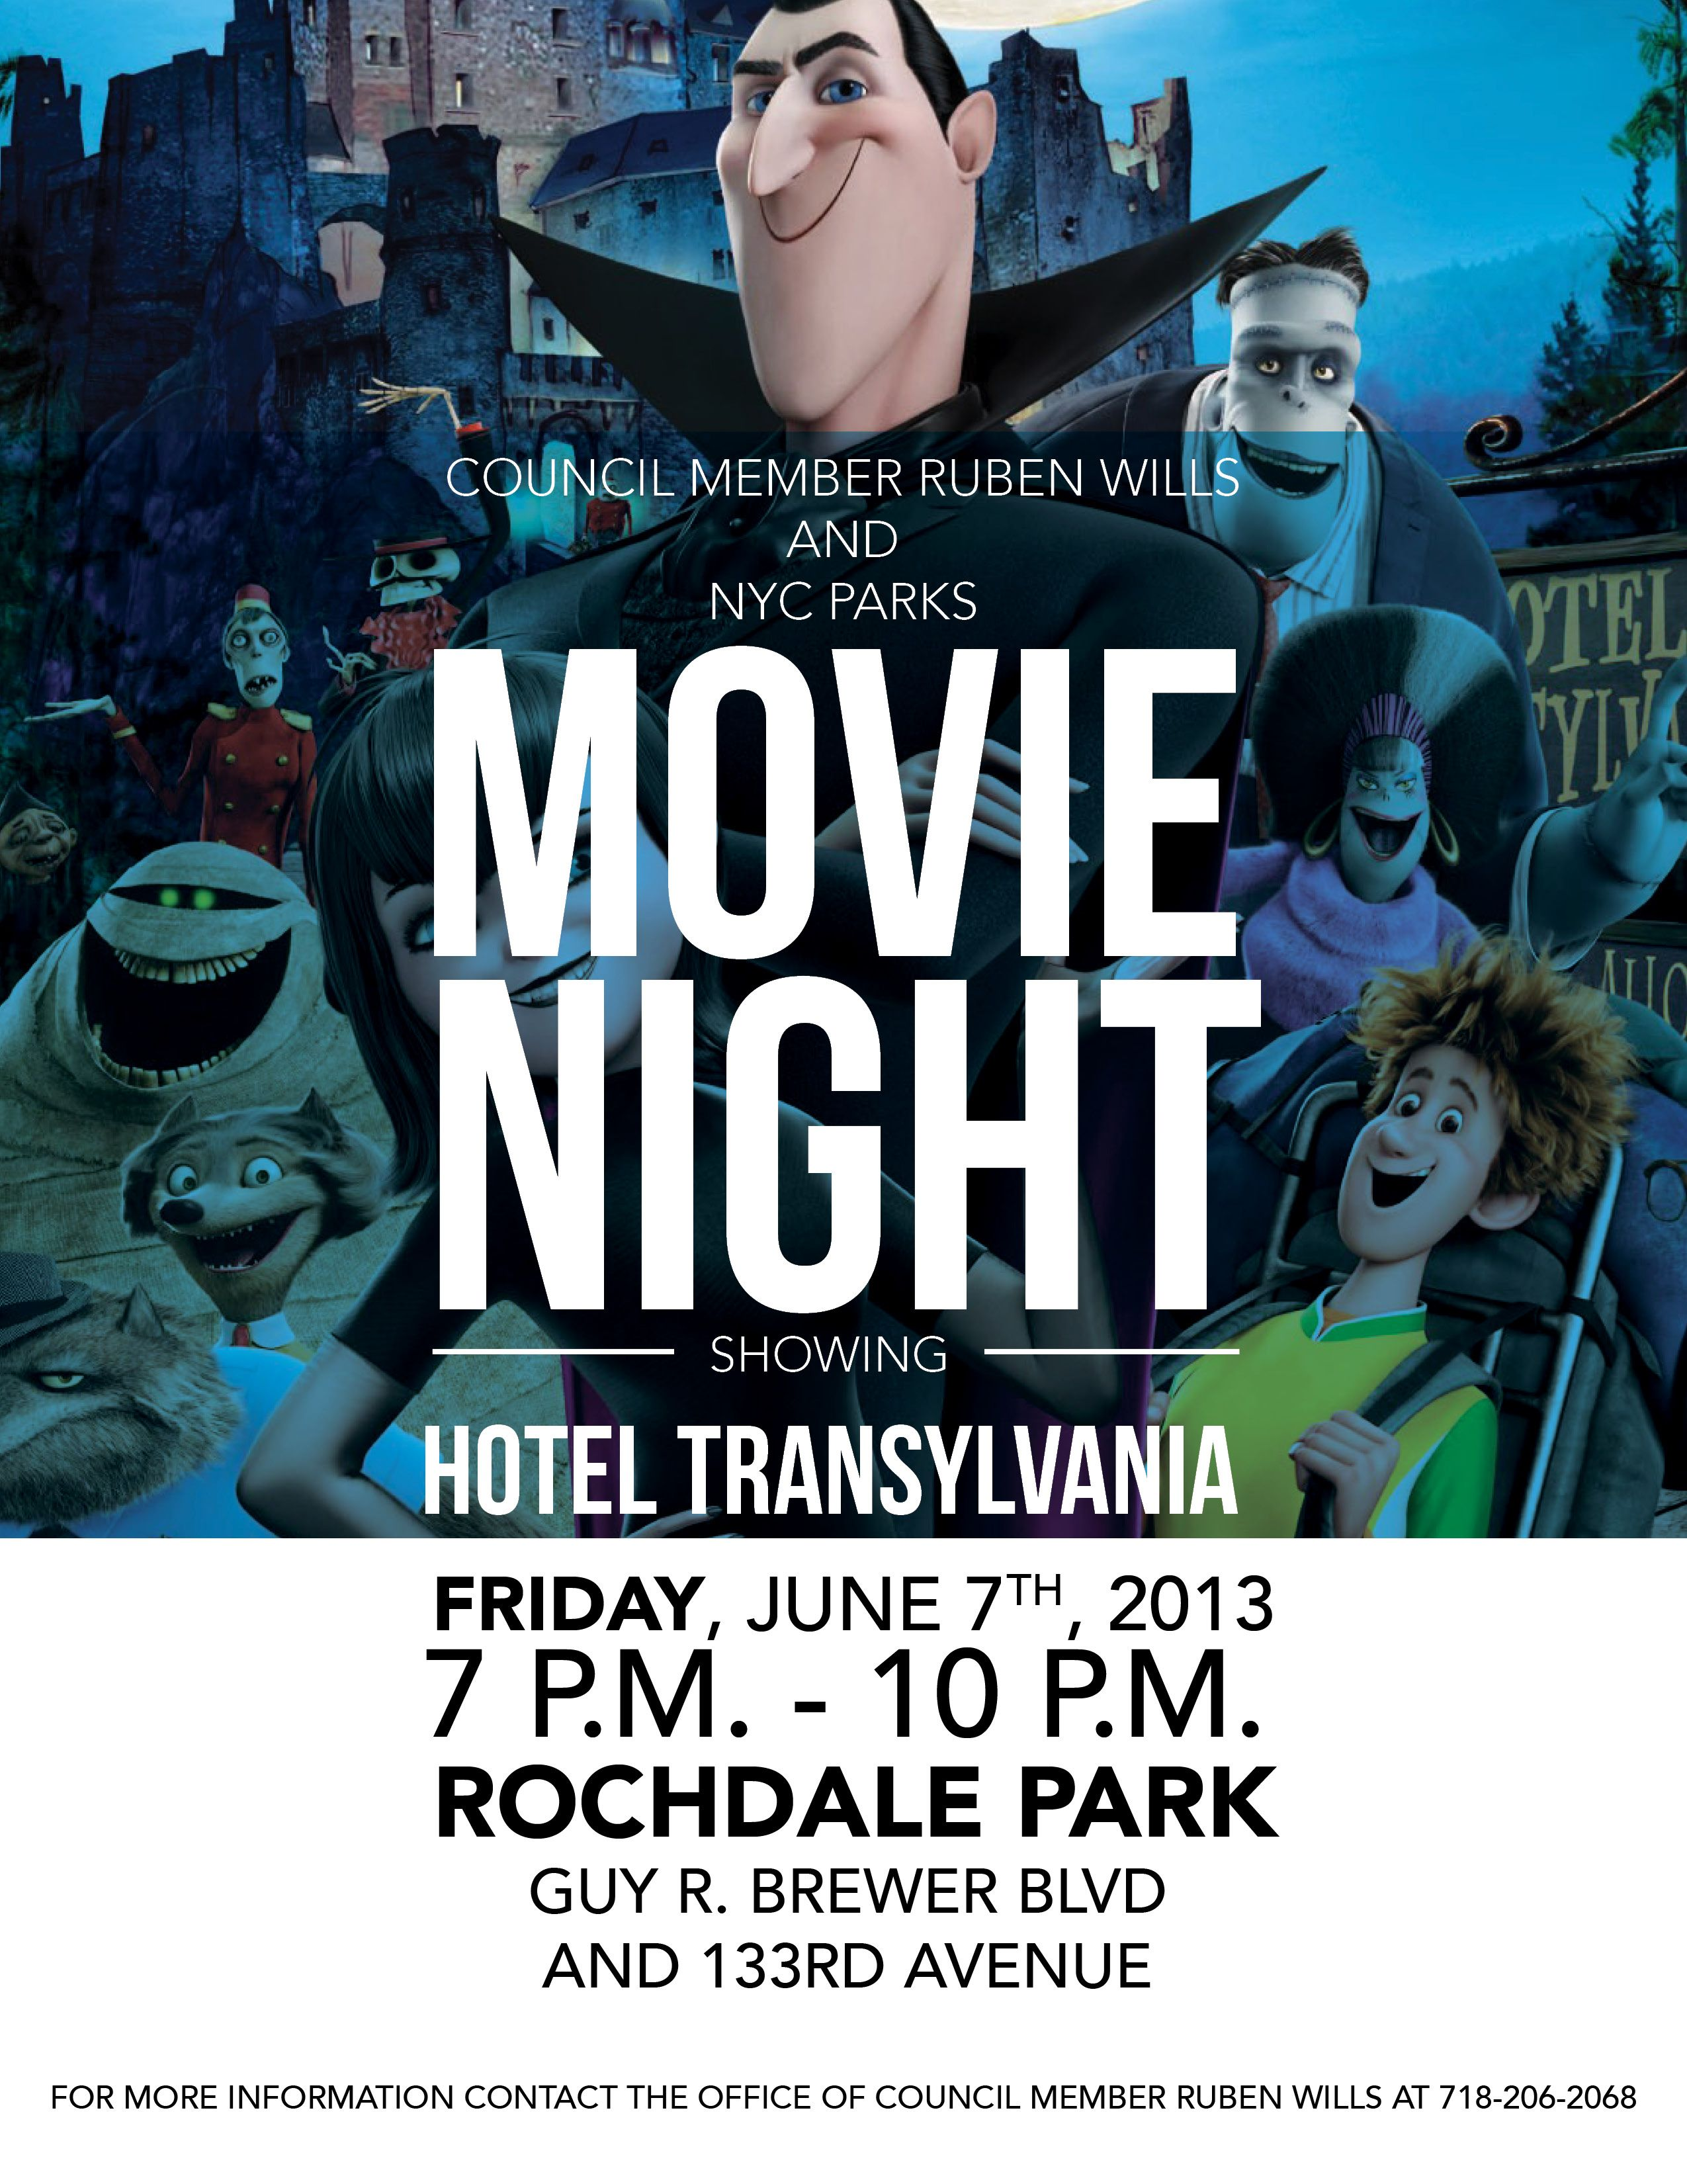 Movie night / screening flyer | Graphic Design | Pinterest